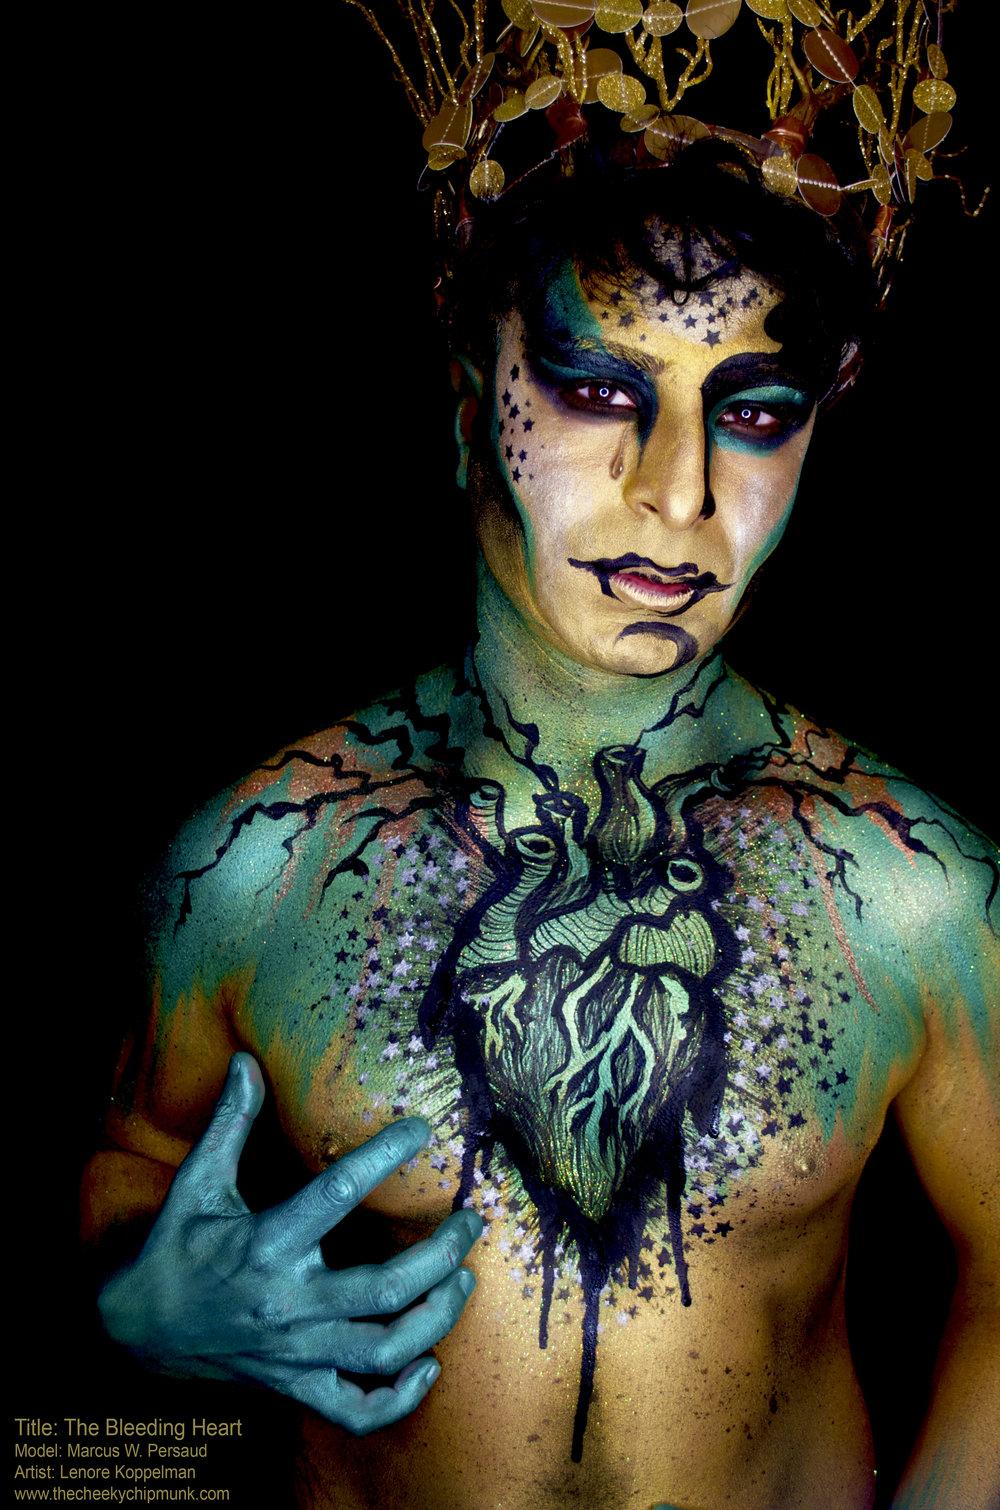 The Bleeding Heart body paint marcus persaud 2.jpg